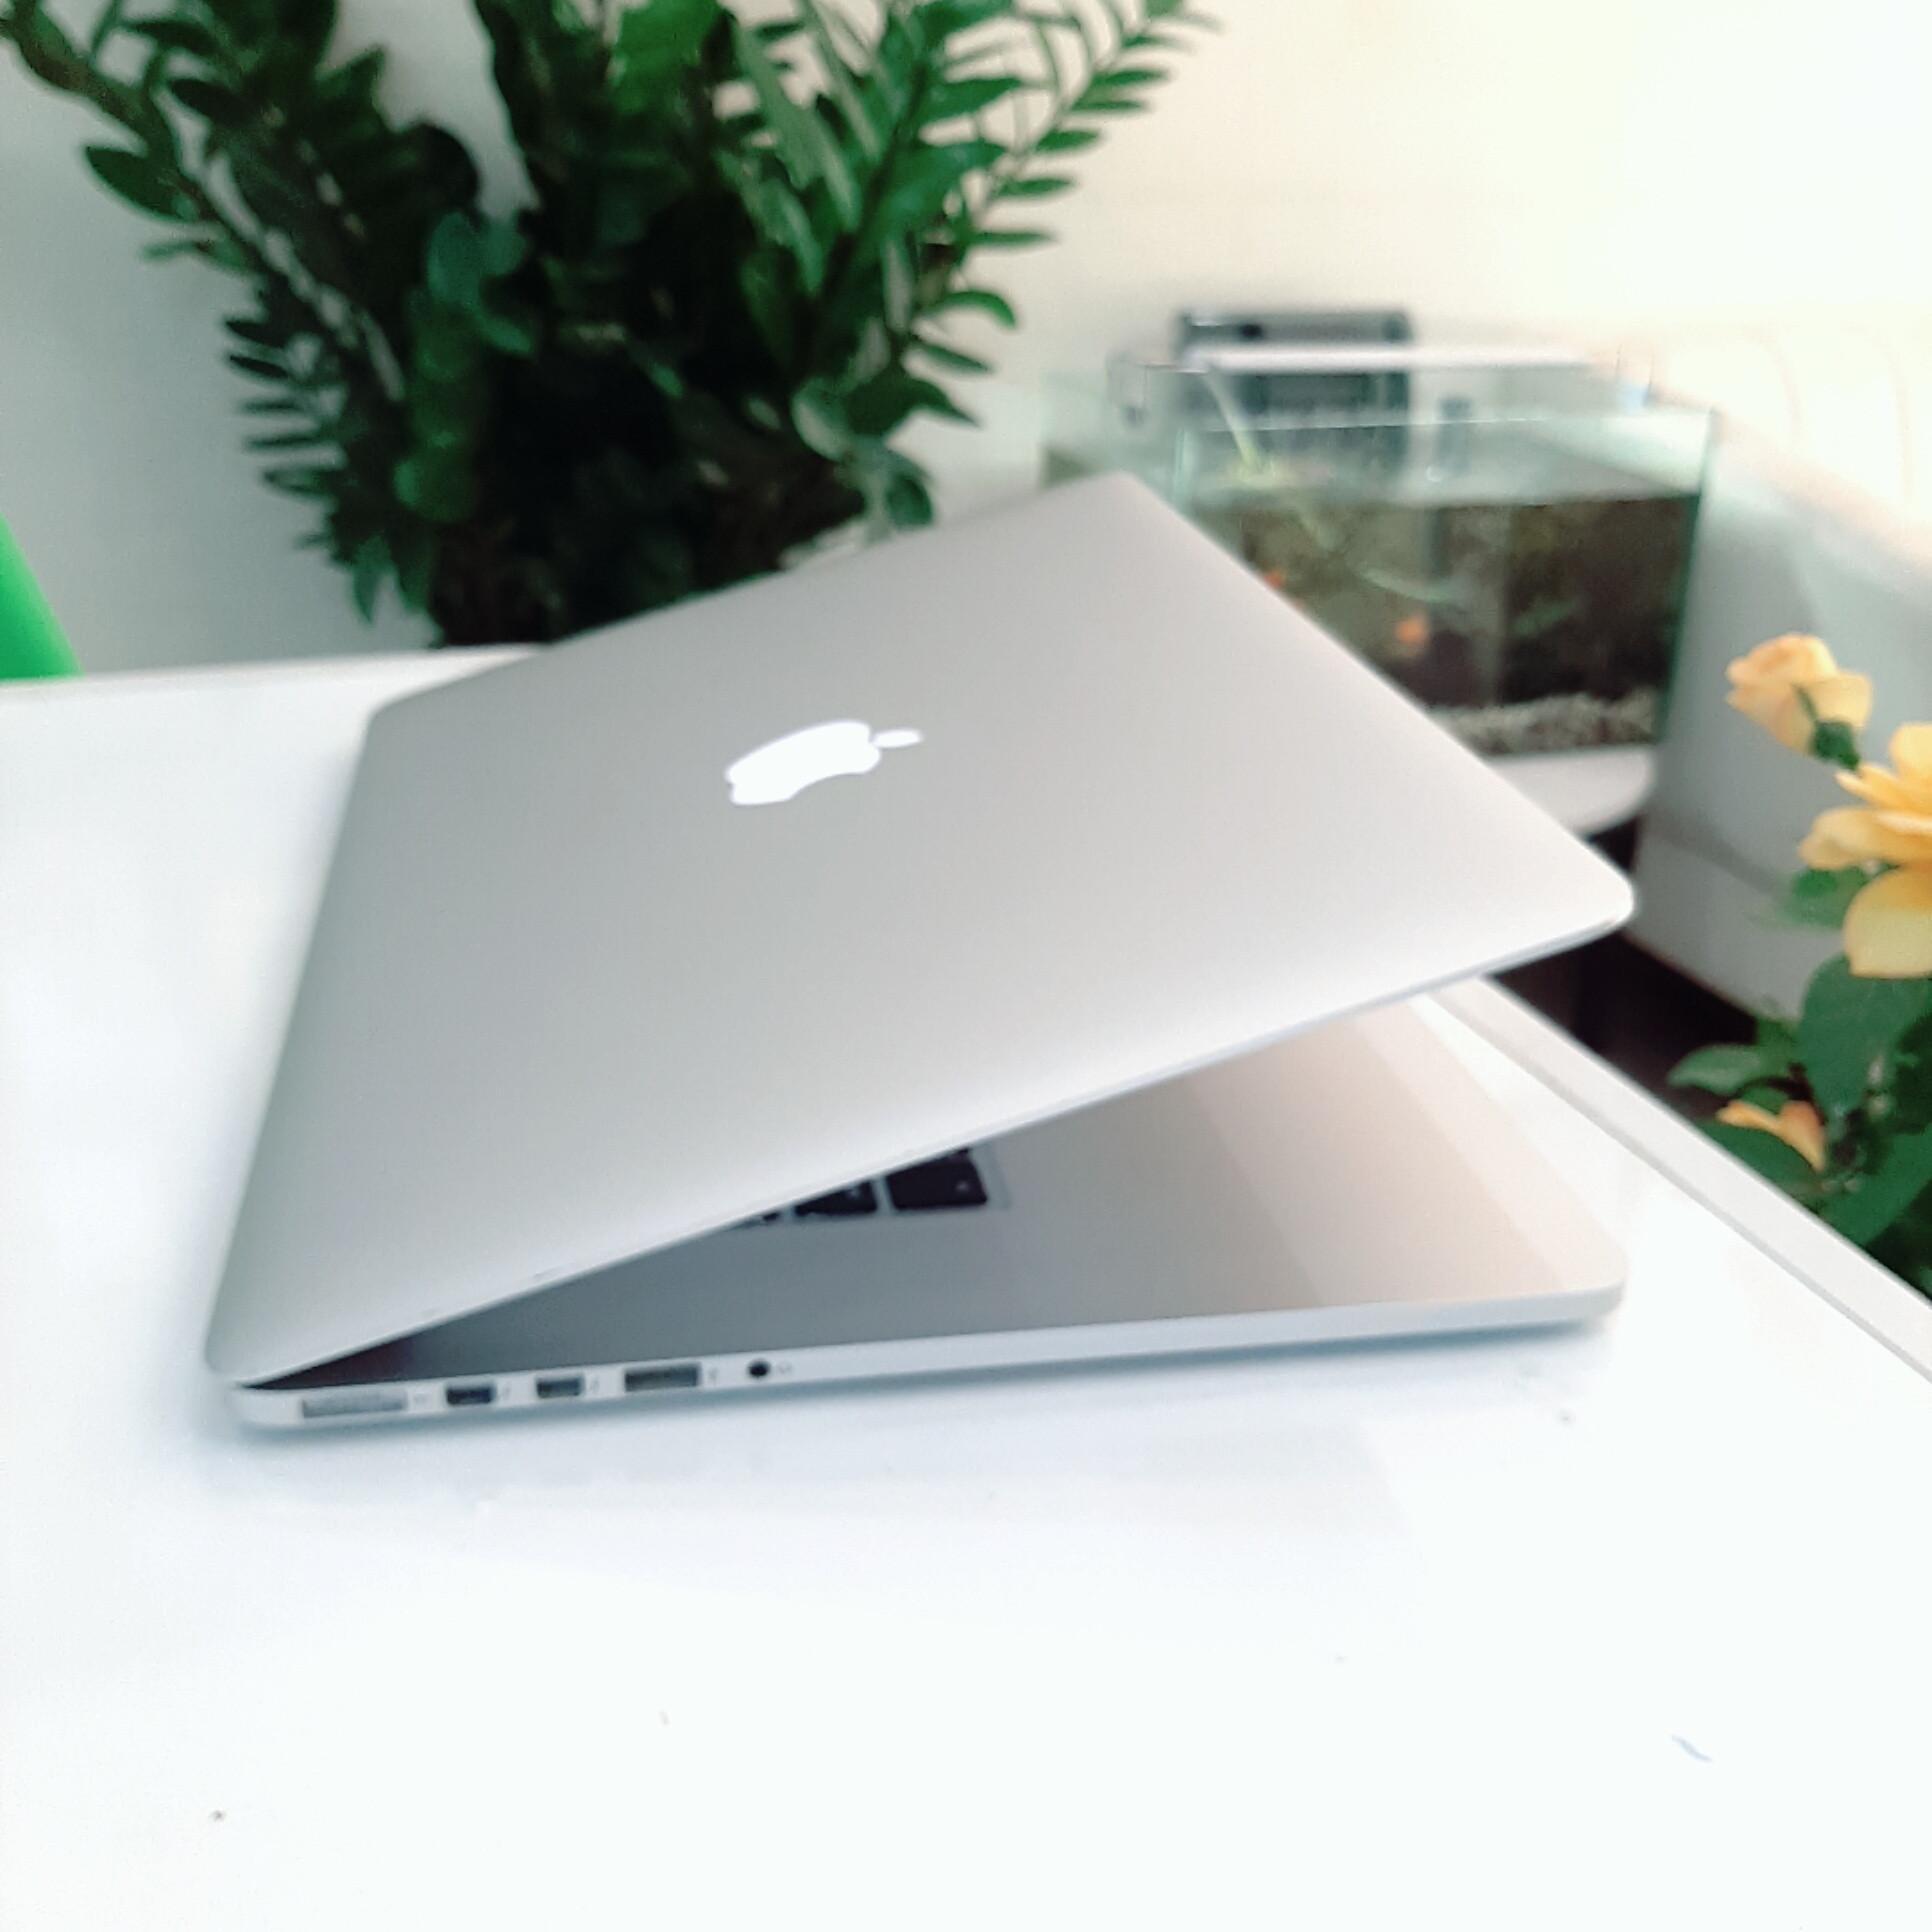 "Macbook Pro 2015 15"", Core i7/16Gb/512Gb"